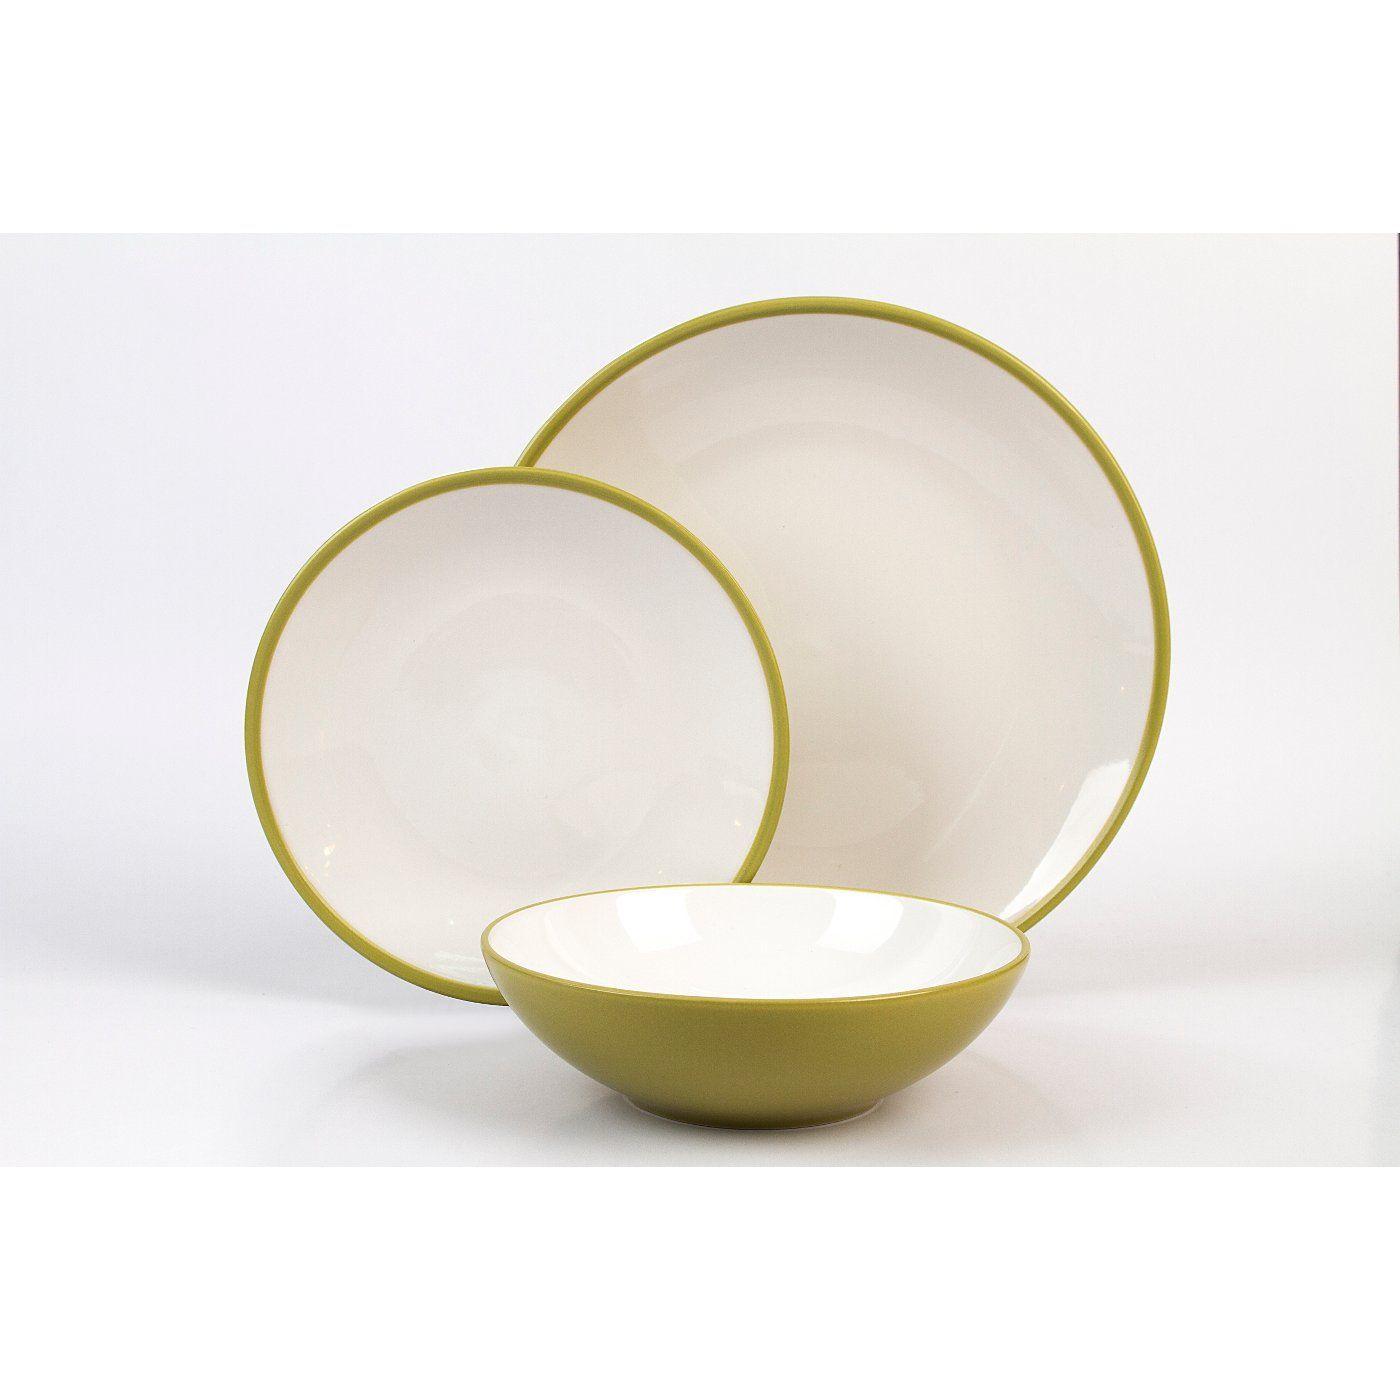 12 Piece Two Tone Matt Guacamole Dinner Set | Tablewares, Kitchen ...